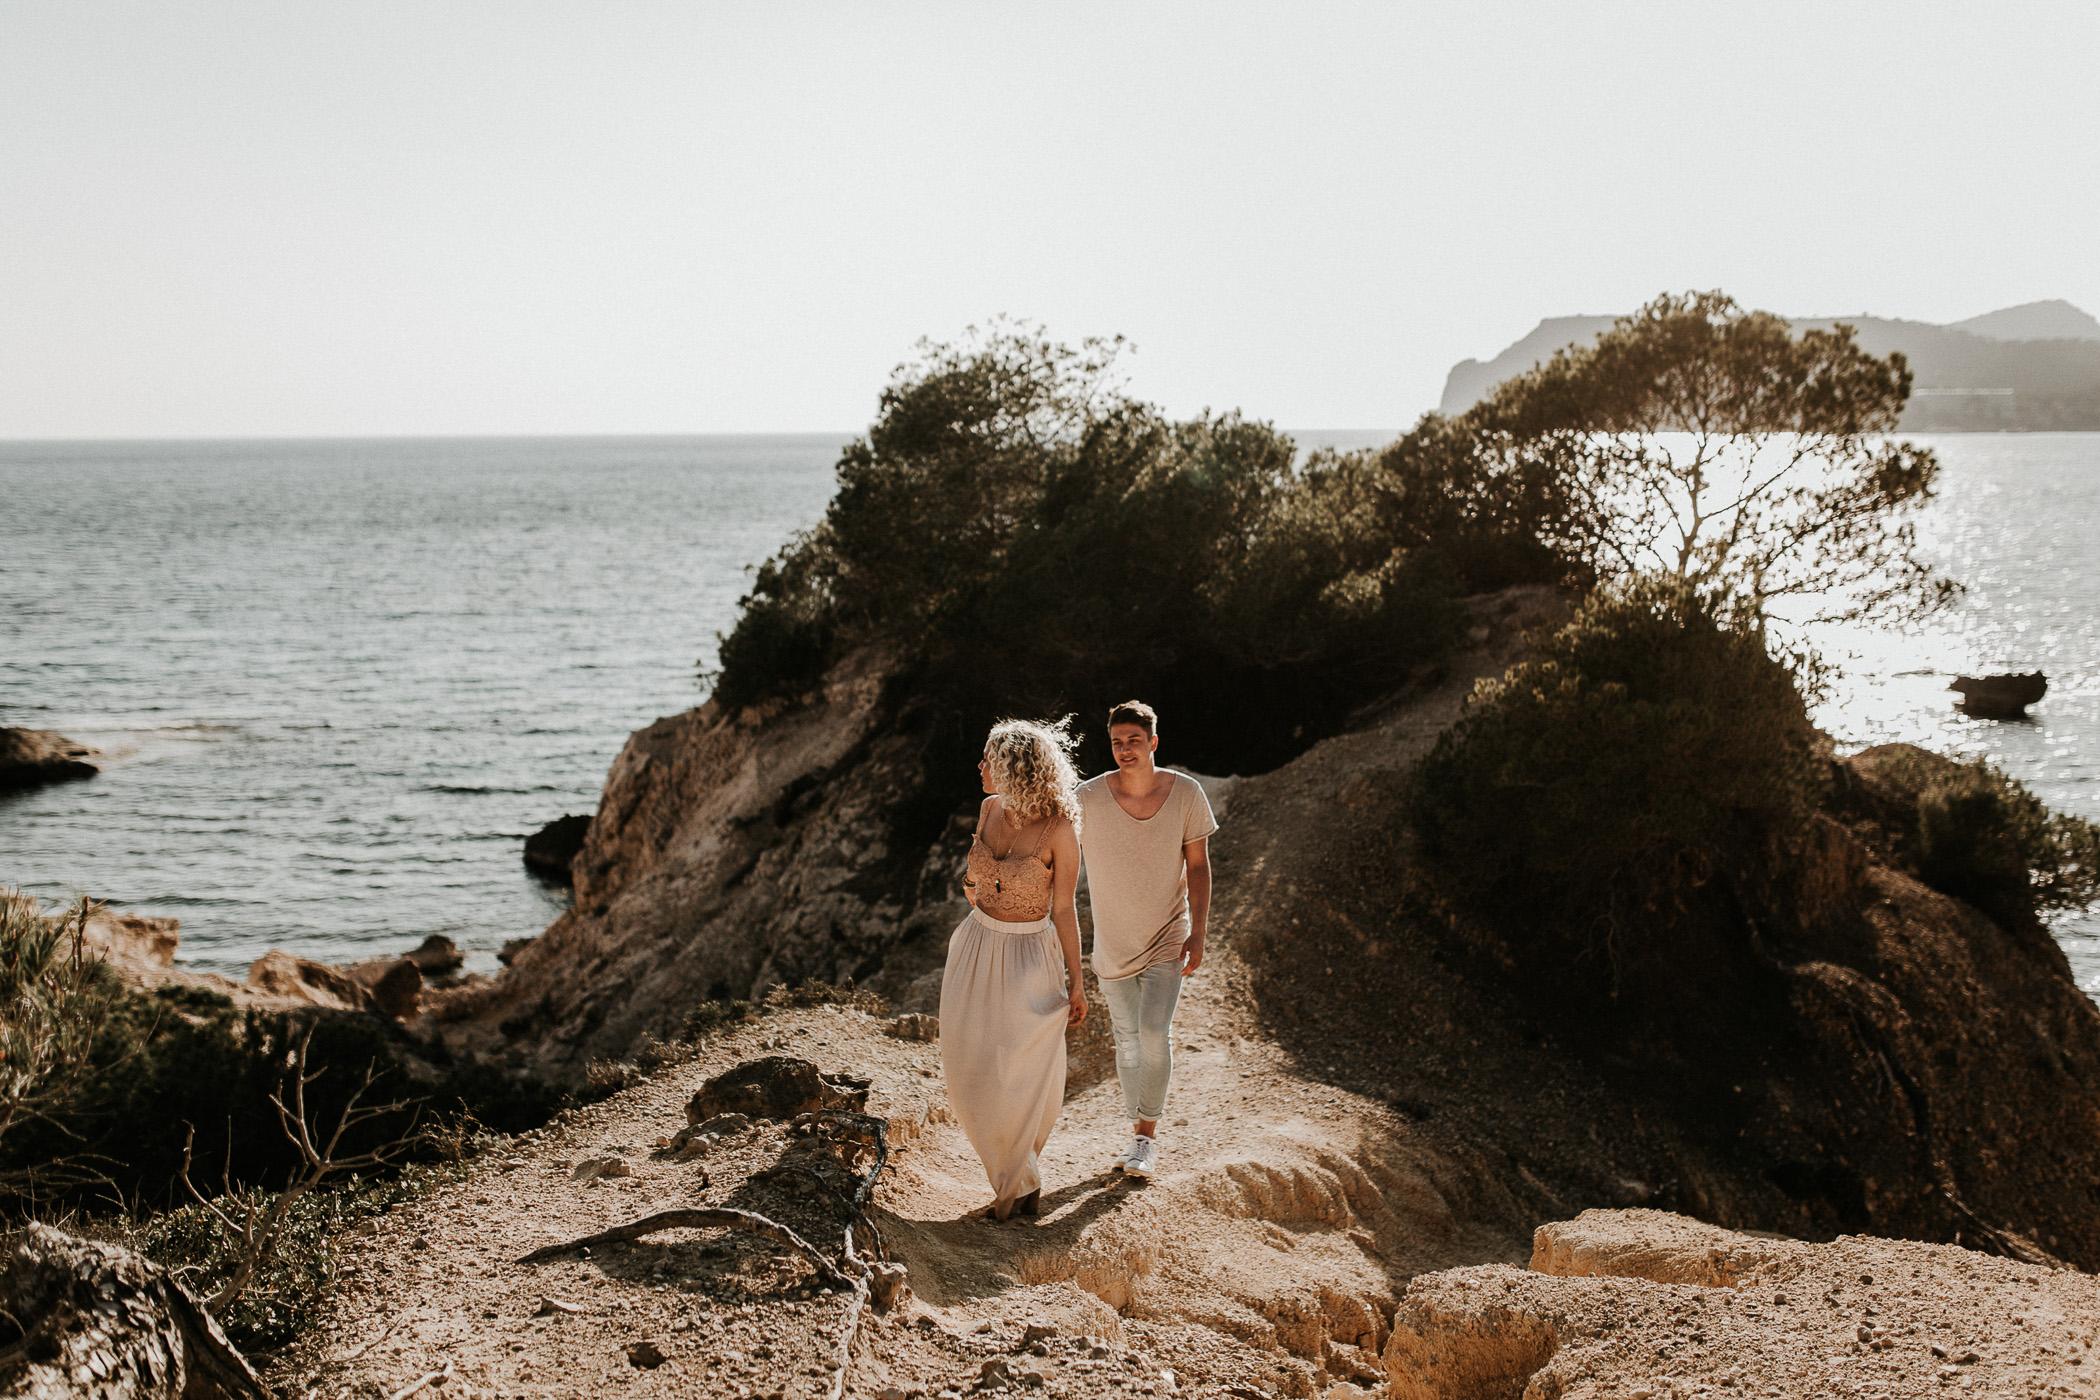 DanielaMarquardtPhotography_elopement_mallorca_spain_paguera_palma_charlyandbela_12